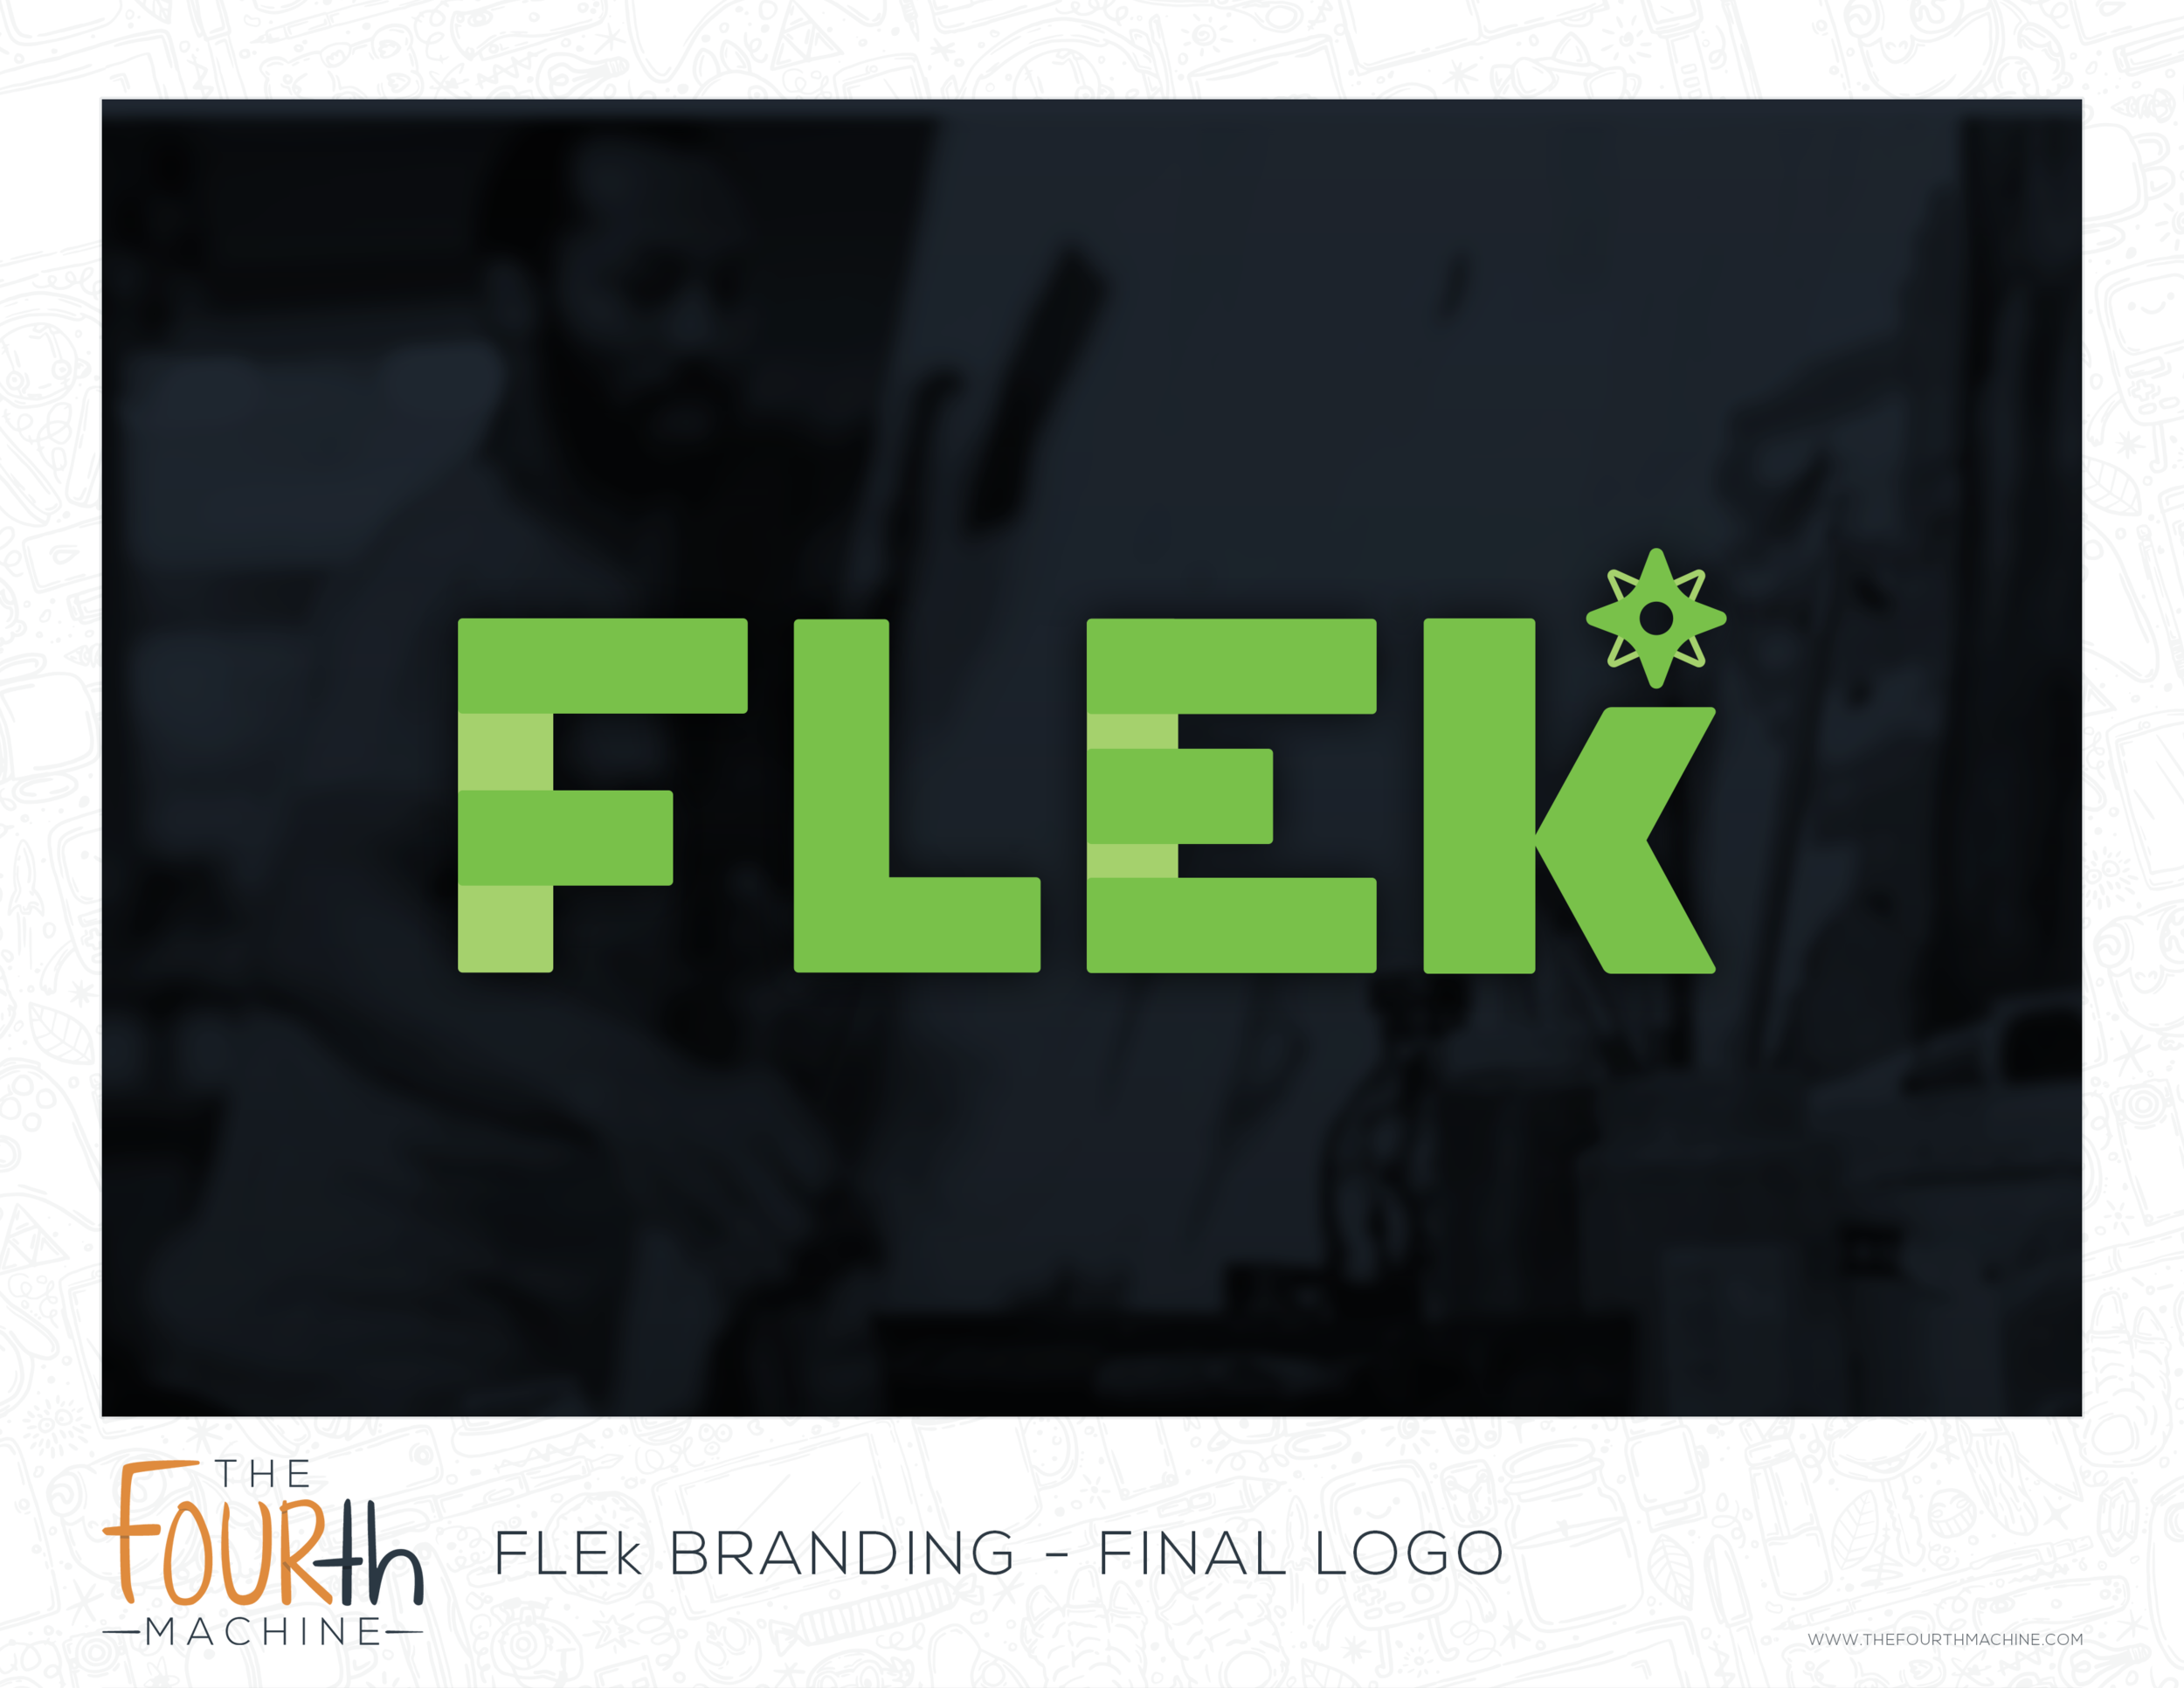 FLEk_Branding_Final_Logo.png